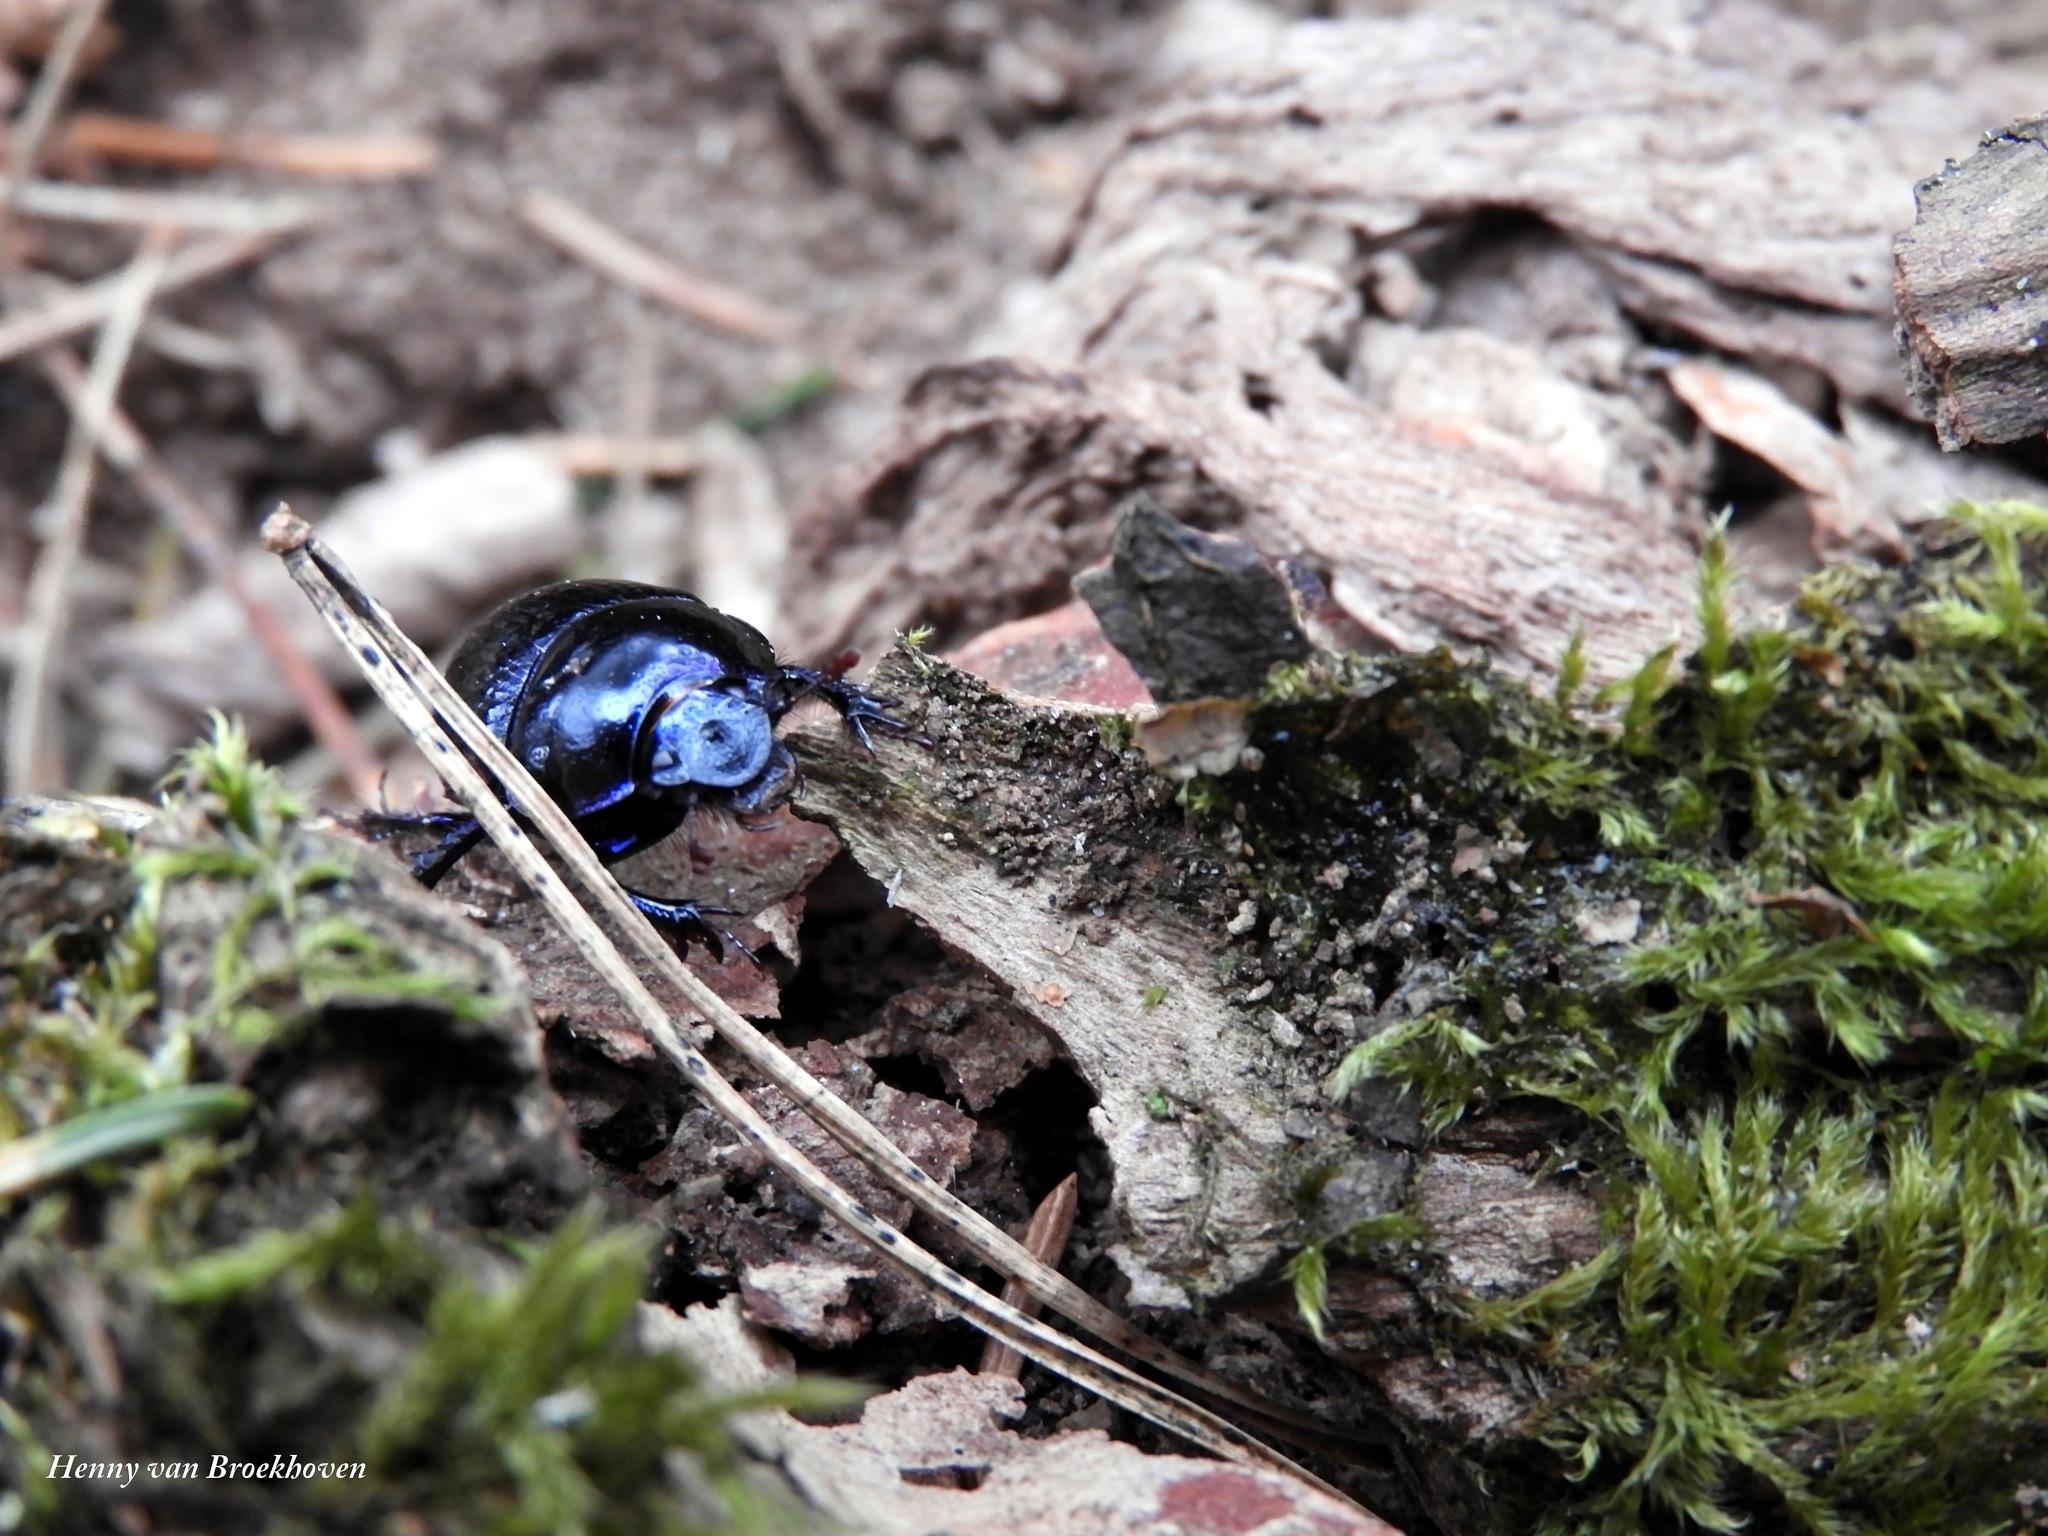 Beetle on the Walk by Henny van Broekhoven